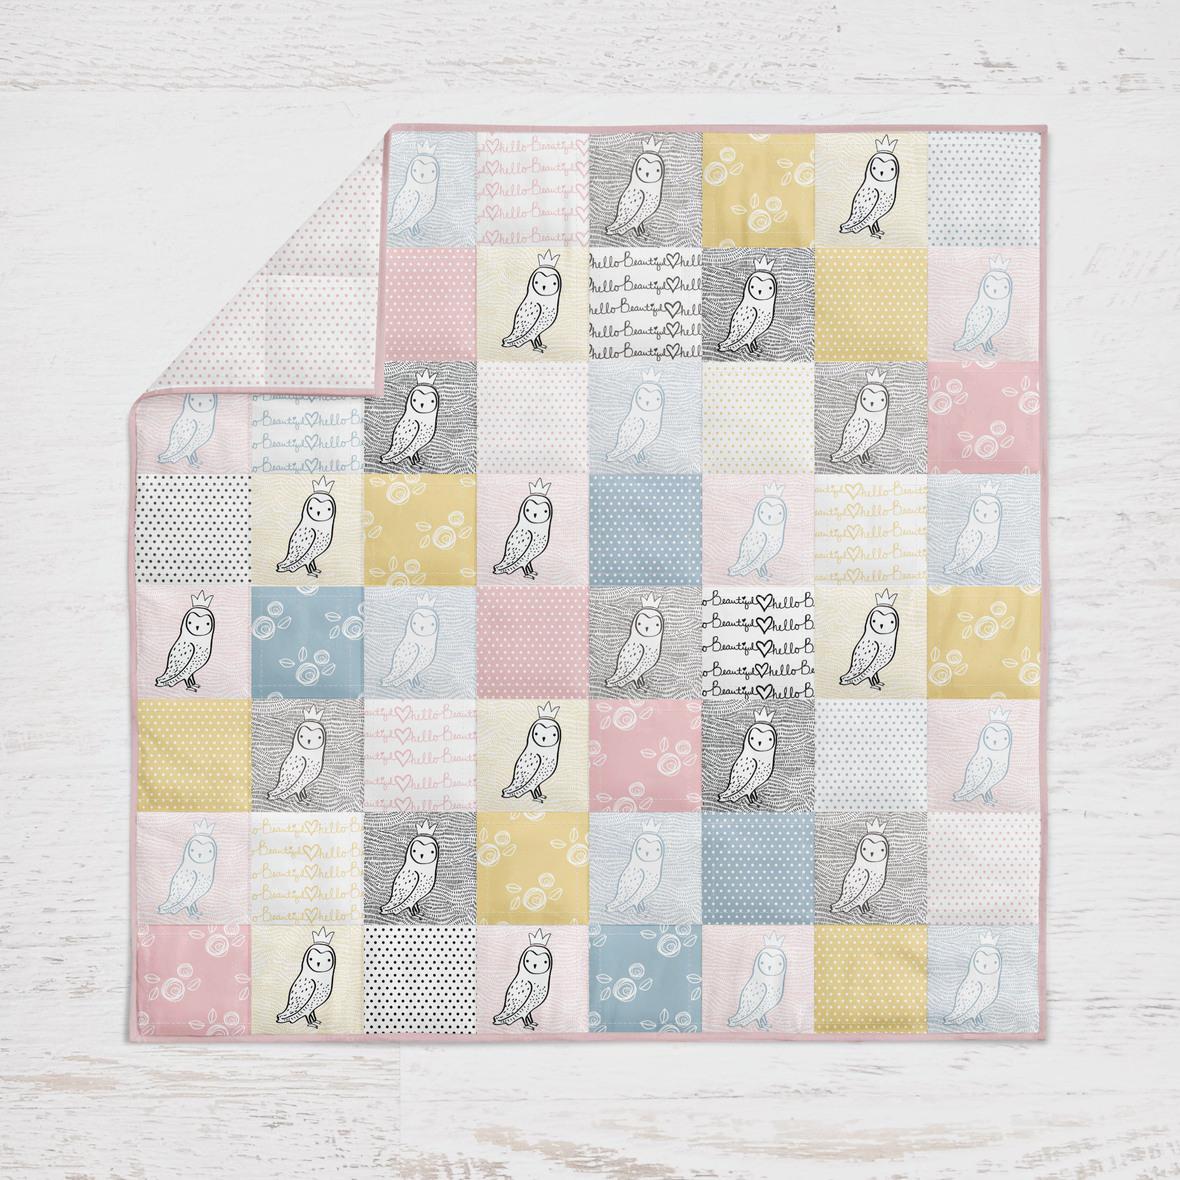 5 in quilt 1